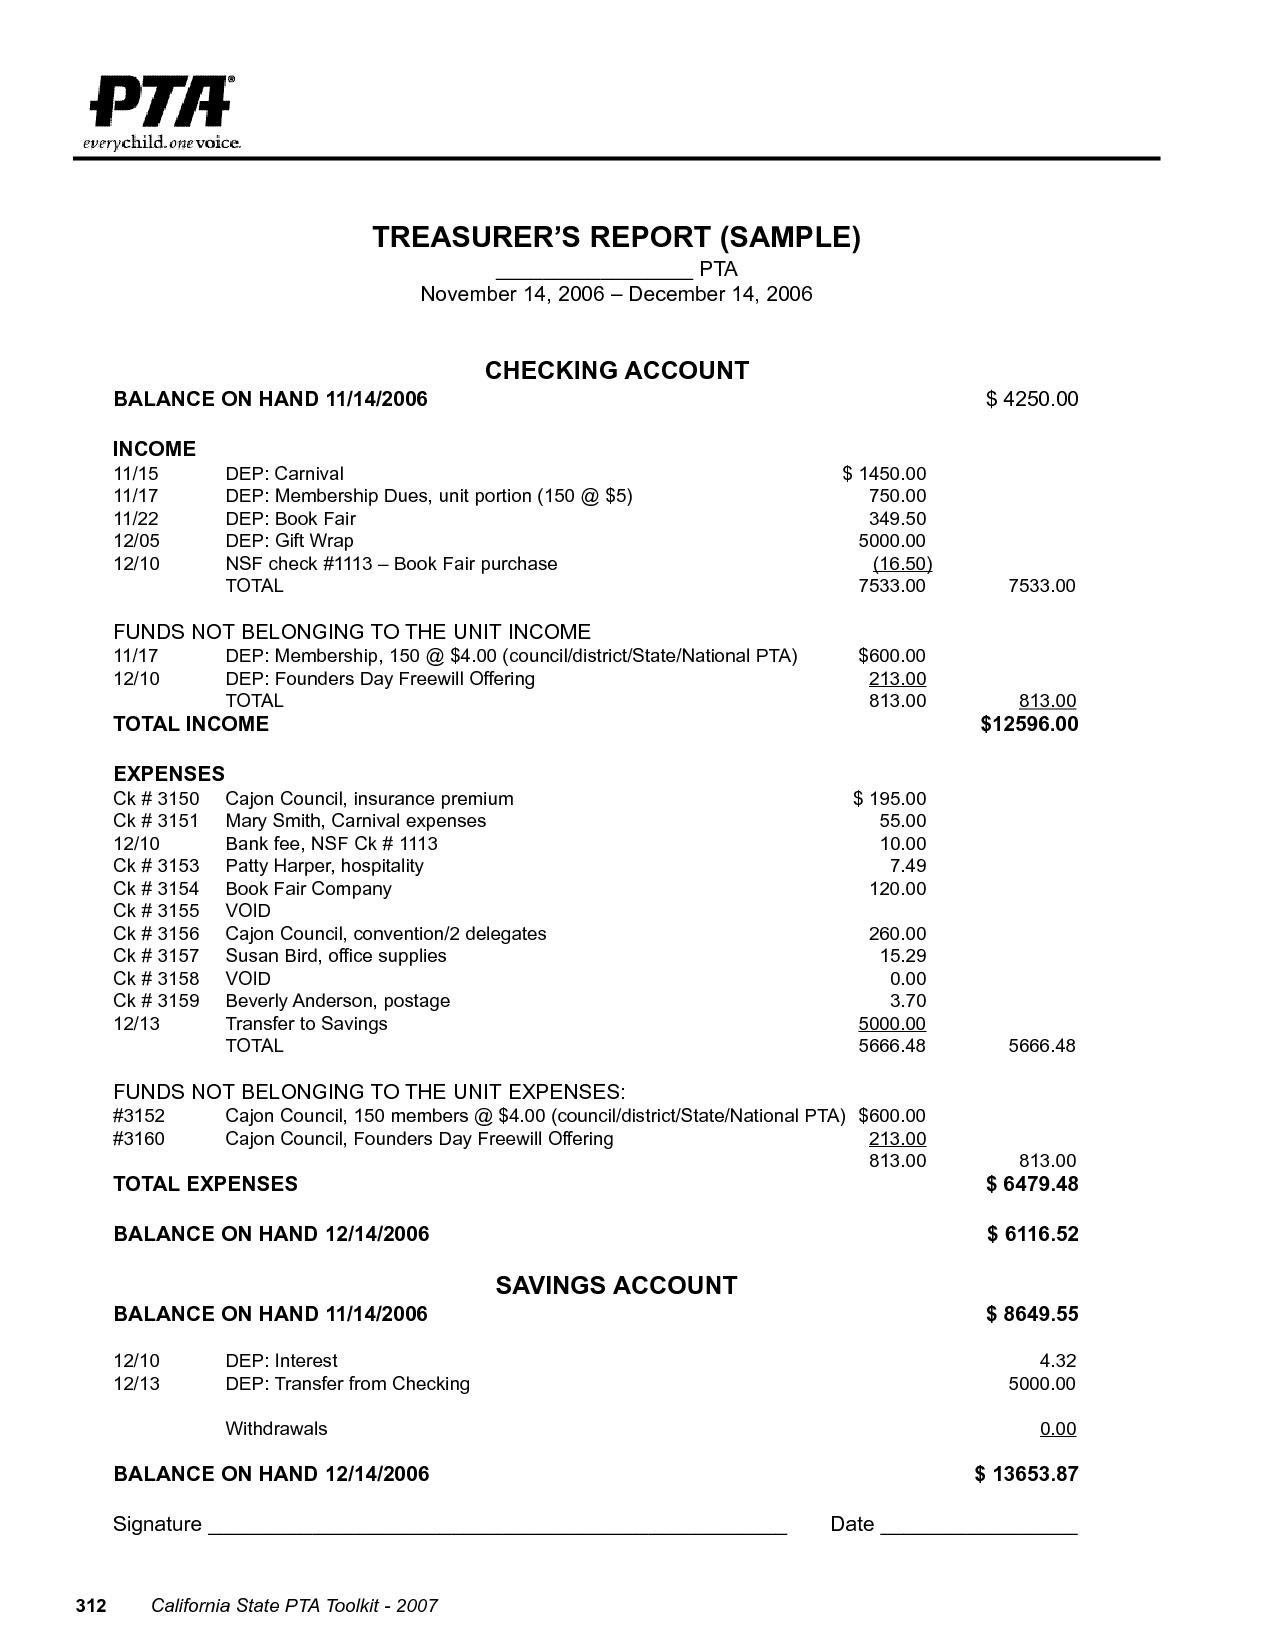 Treasurer Report Template - 10+ Free Sample, Example, Format Download    Free & Premium Templates   Financial Report   Pinterest   Template, Pta And  Free.